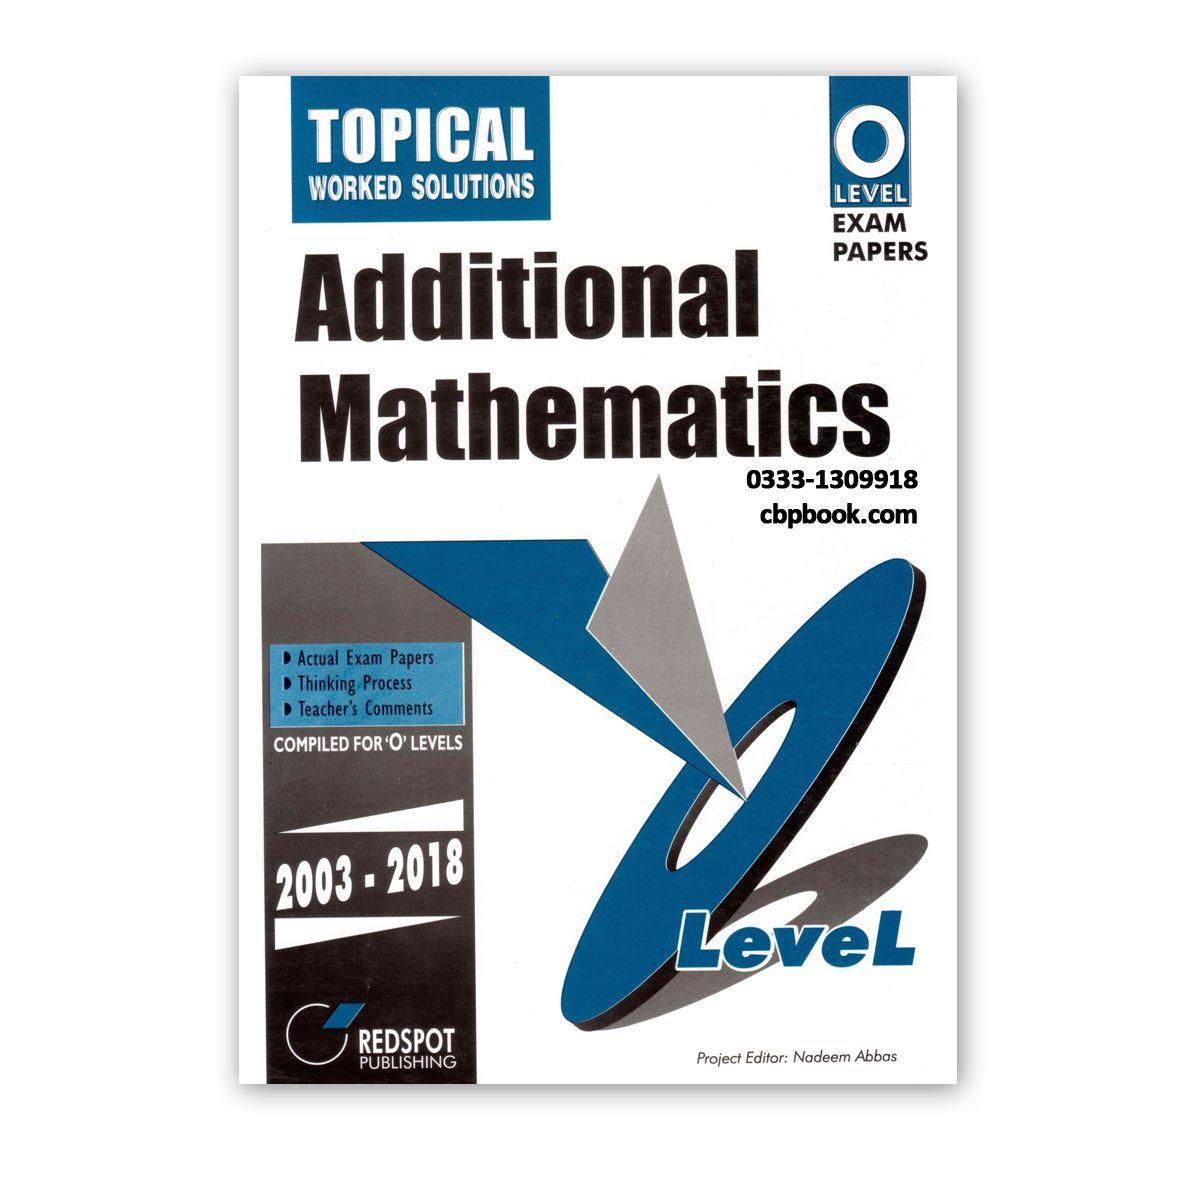 O Level Additional Mathematics Topical 2020 Edition Redspot Cbpbook Pakistan S Largest Online Book Store O Levels Exam Papers Mathematics Additional mathematics textbook pdf